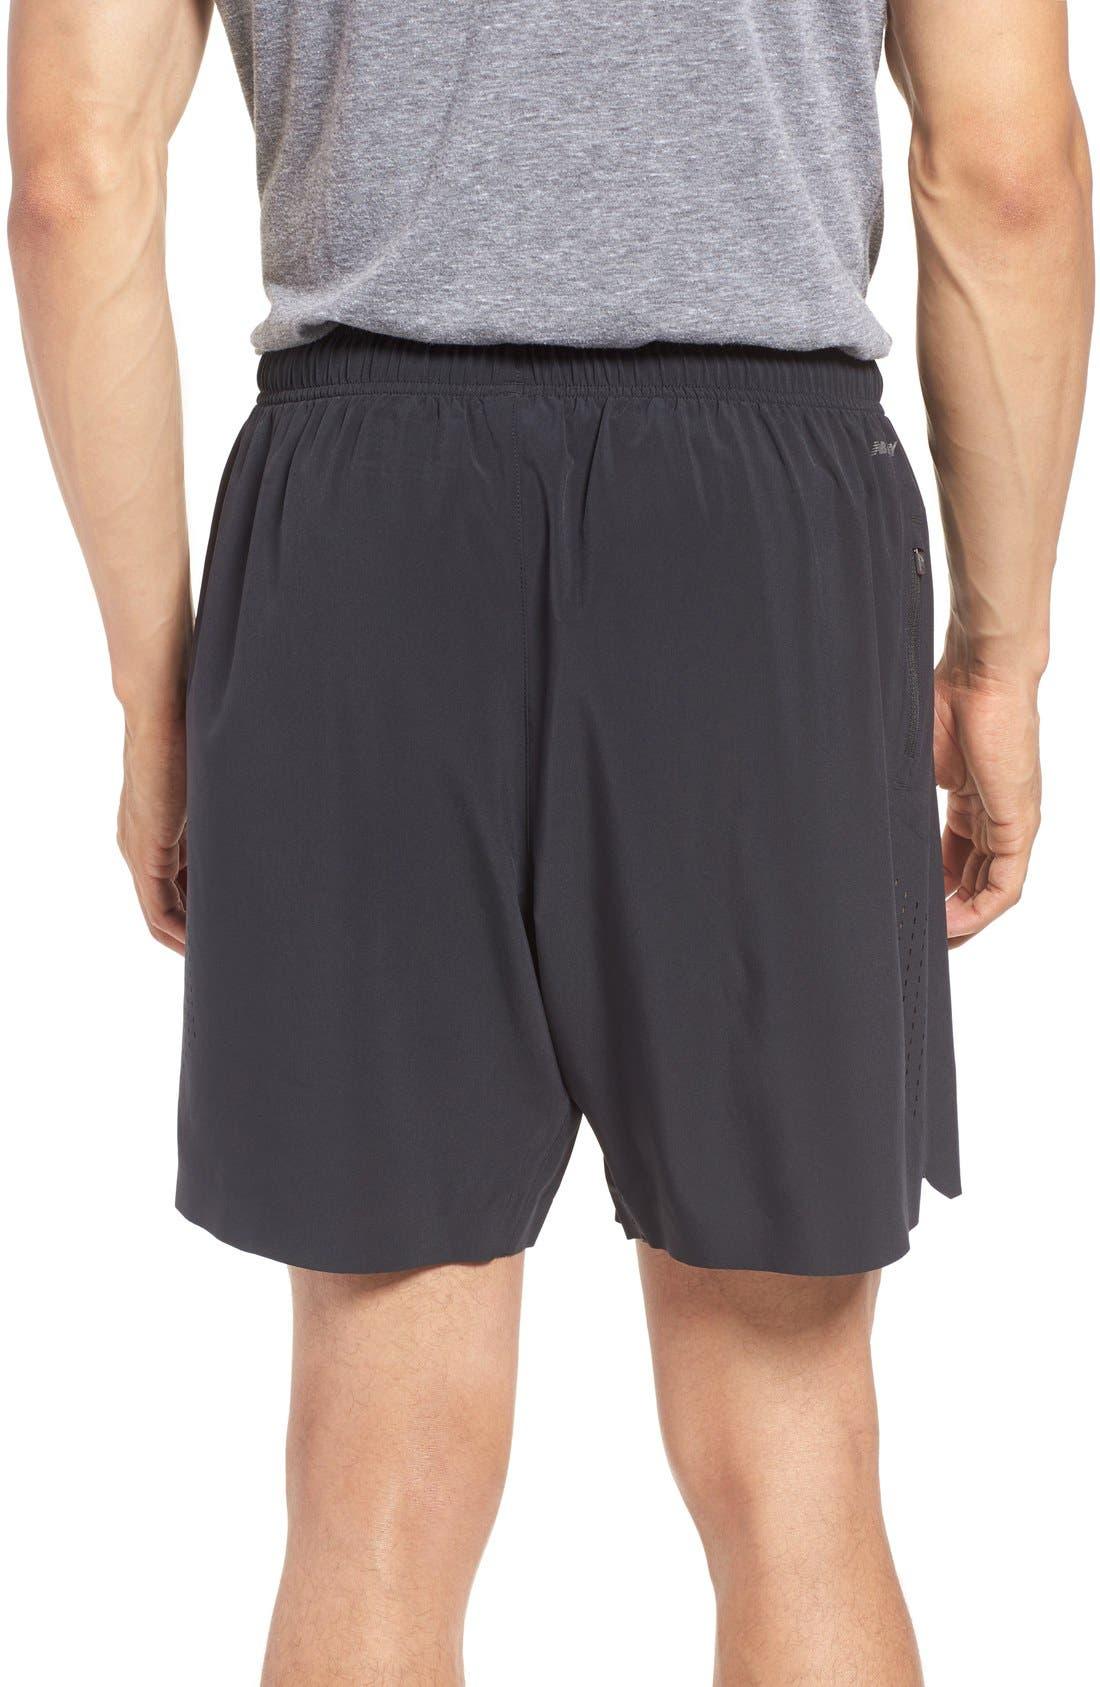 'Shift' Athletic Fit Training Shorts,                             Alternate thumbnail 2, color,                             Black